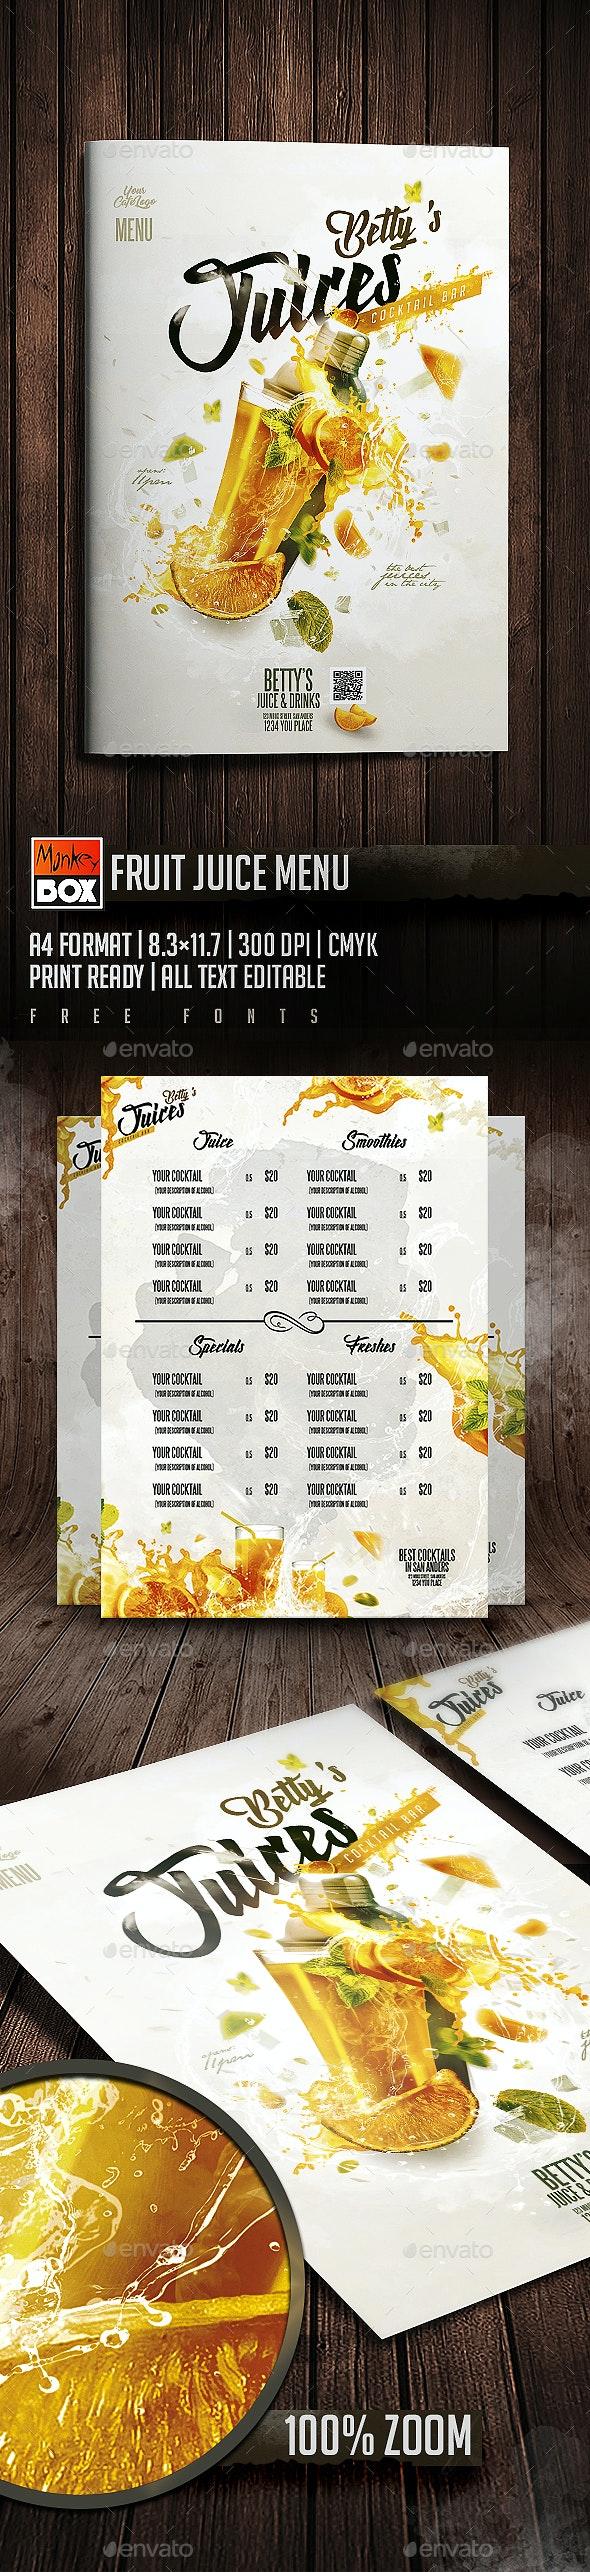 Fruit Juice Menu - Food Menus Print Templates